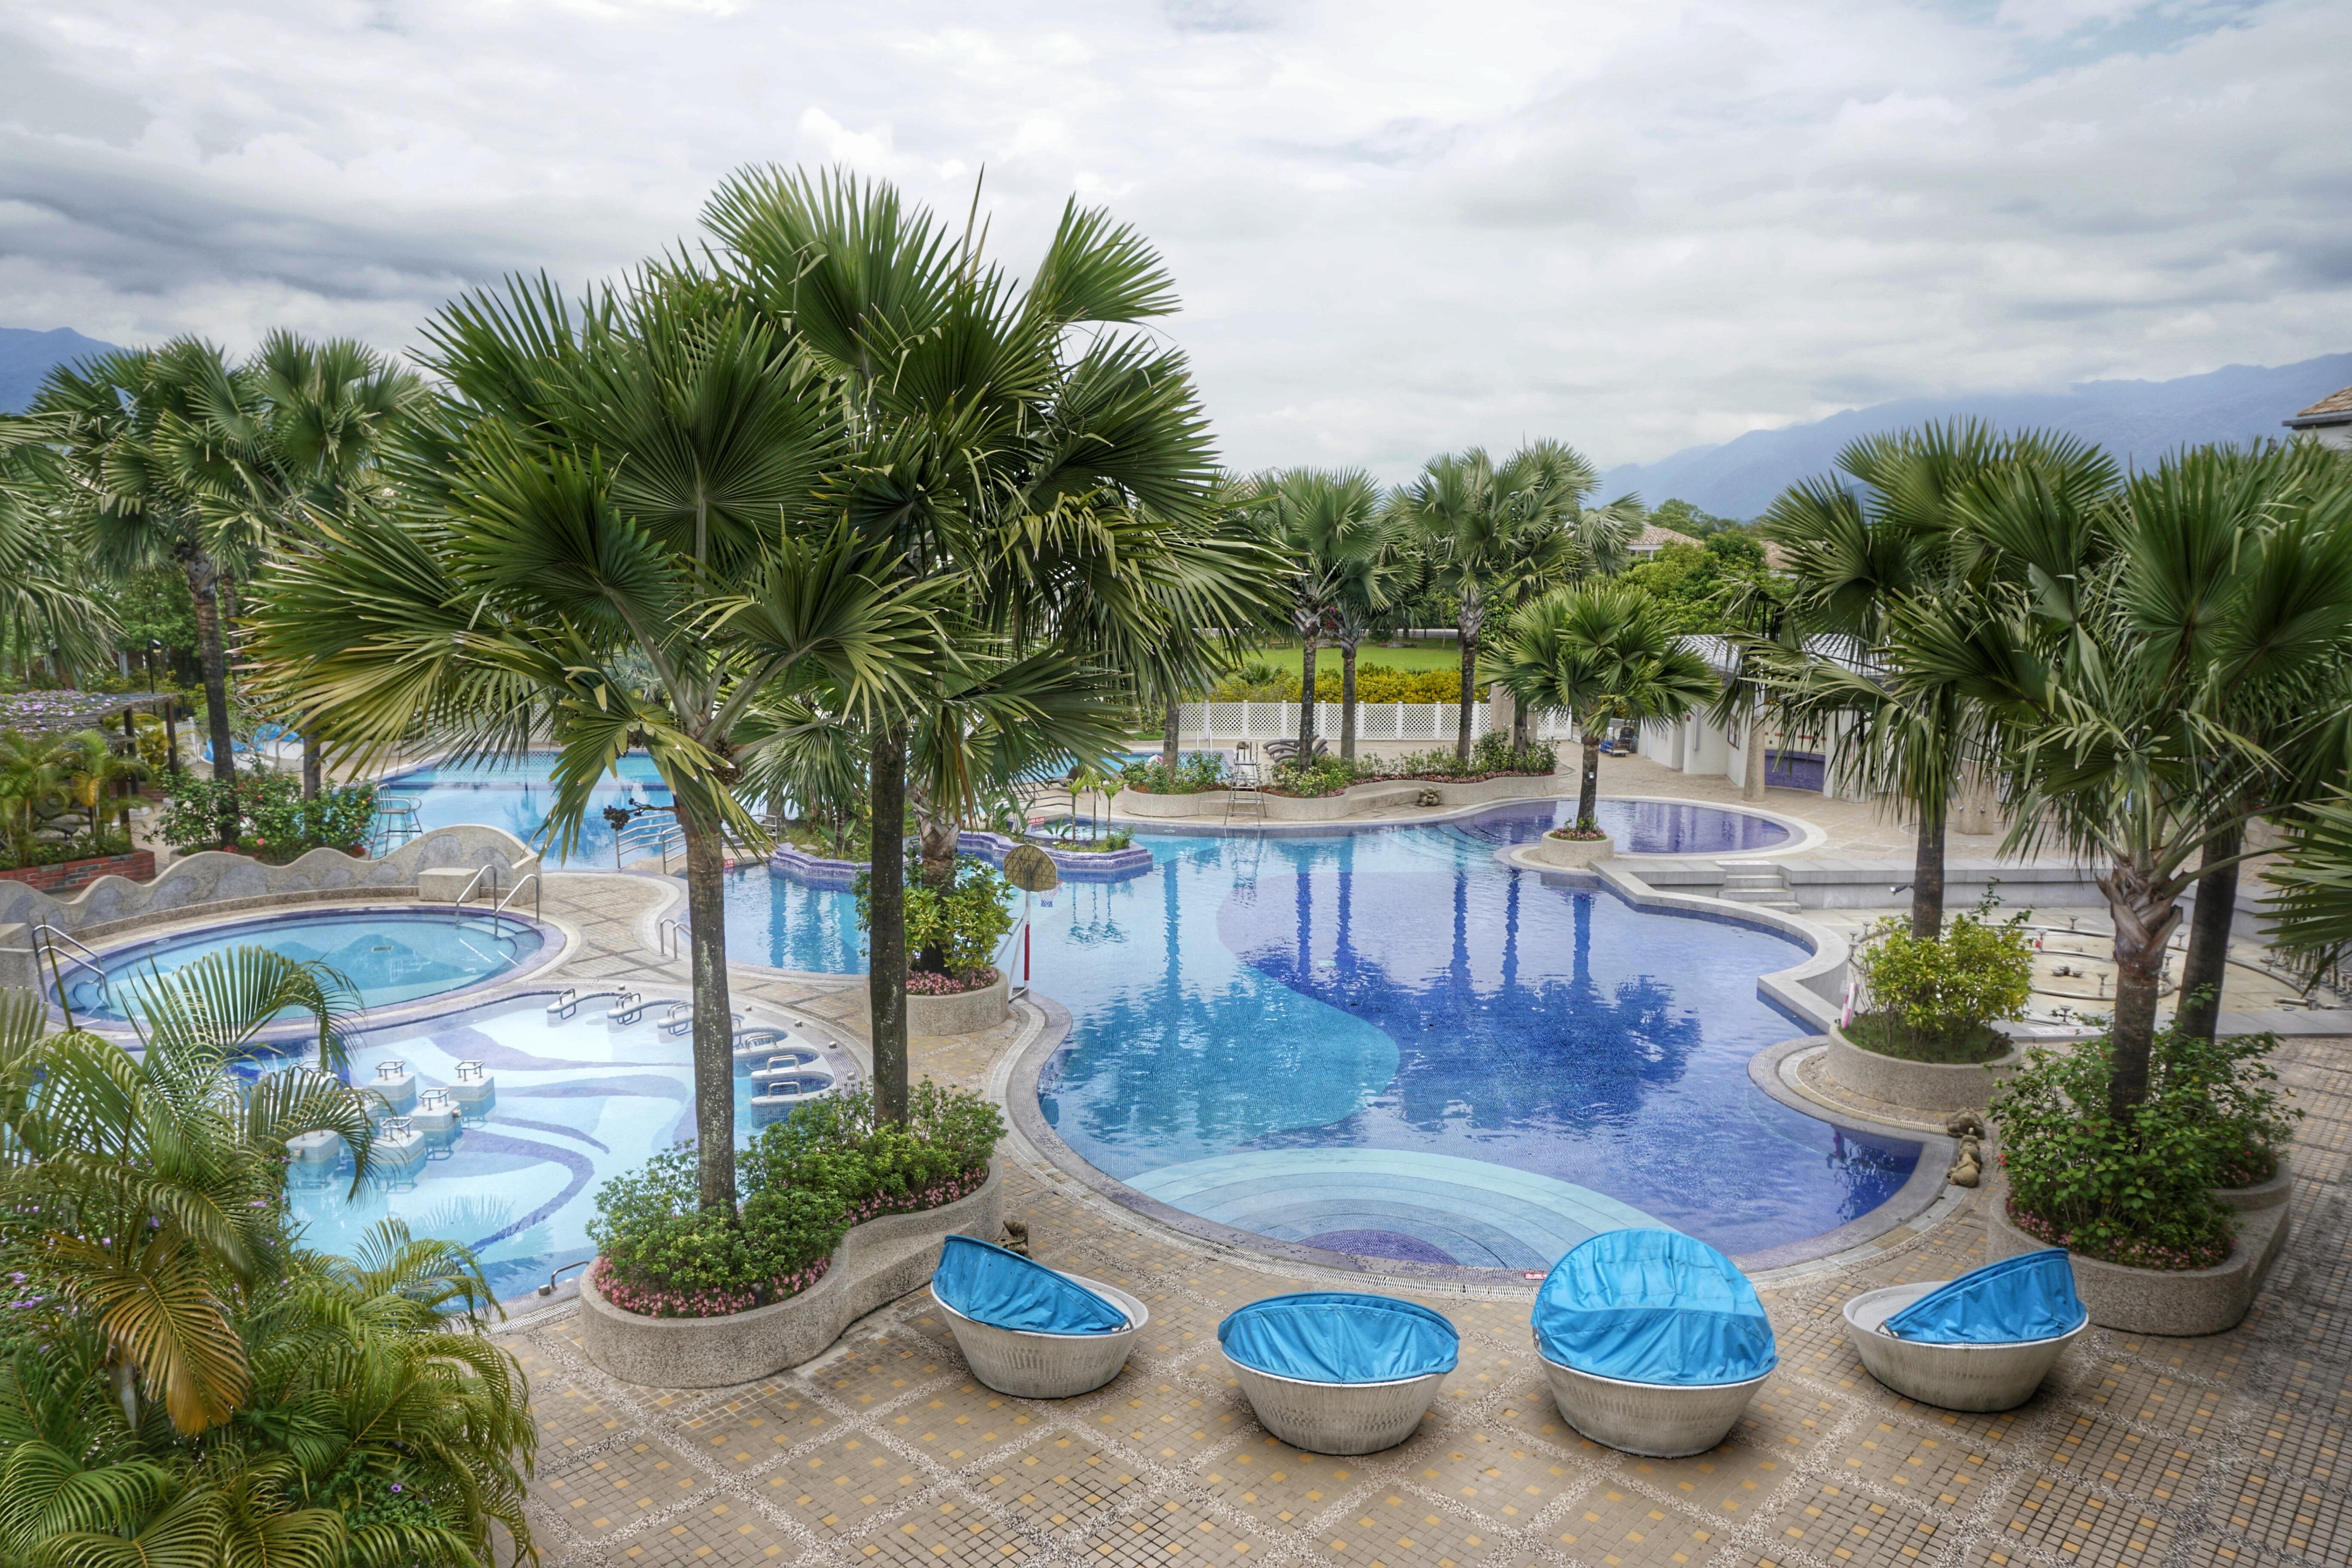 Free Images : villa, vacation, swimming pool, lagoon, property ...